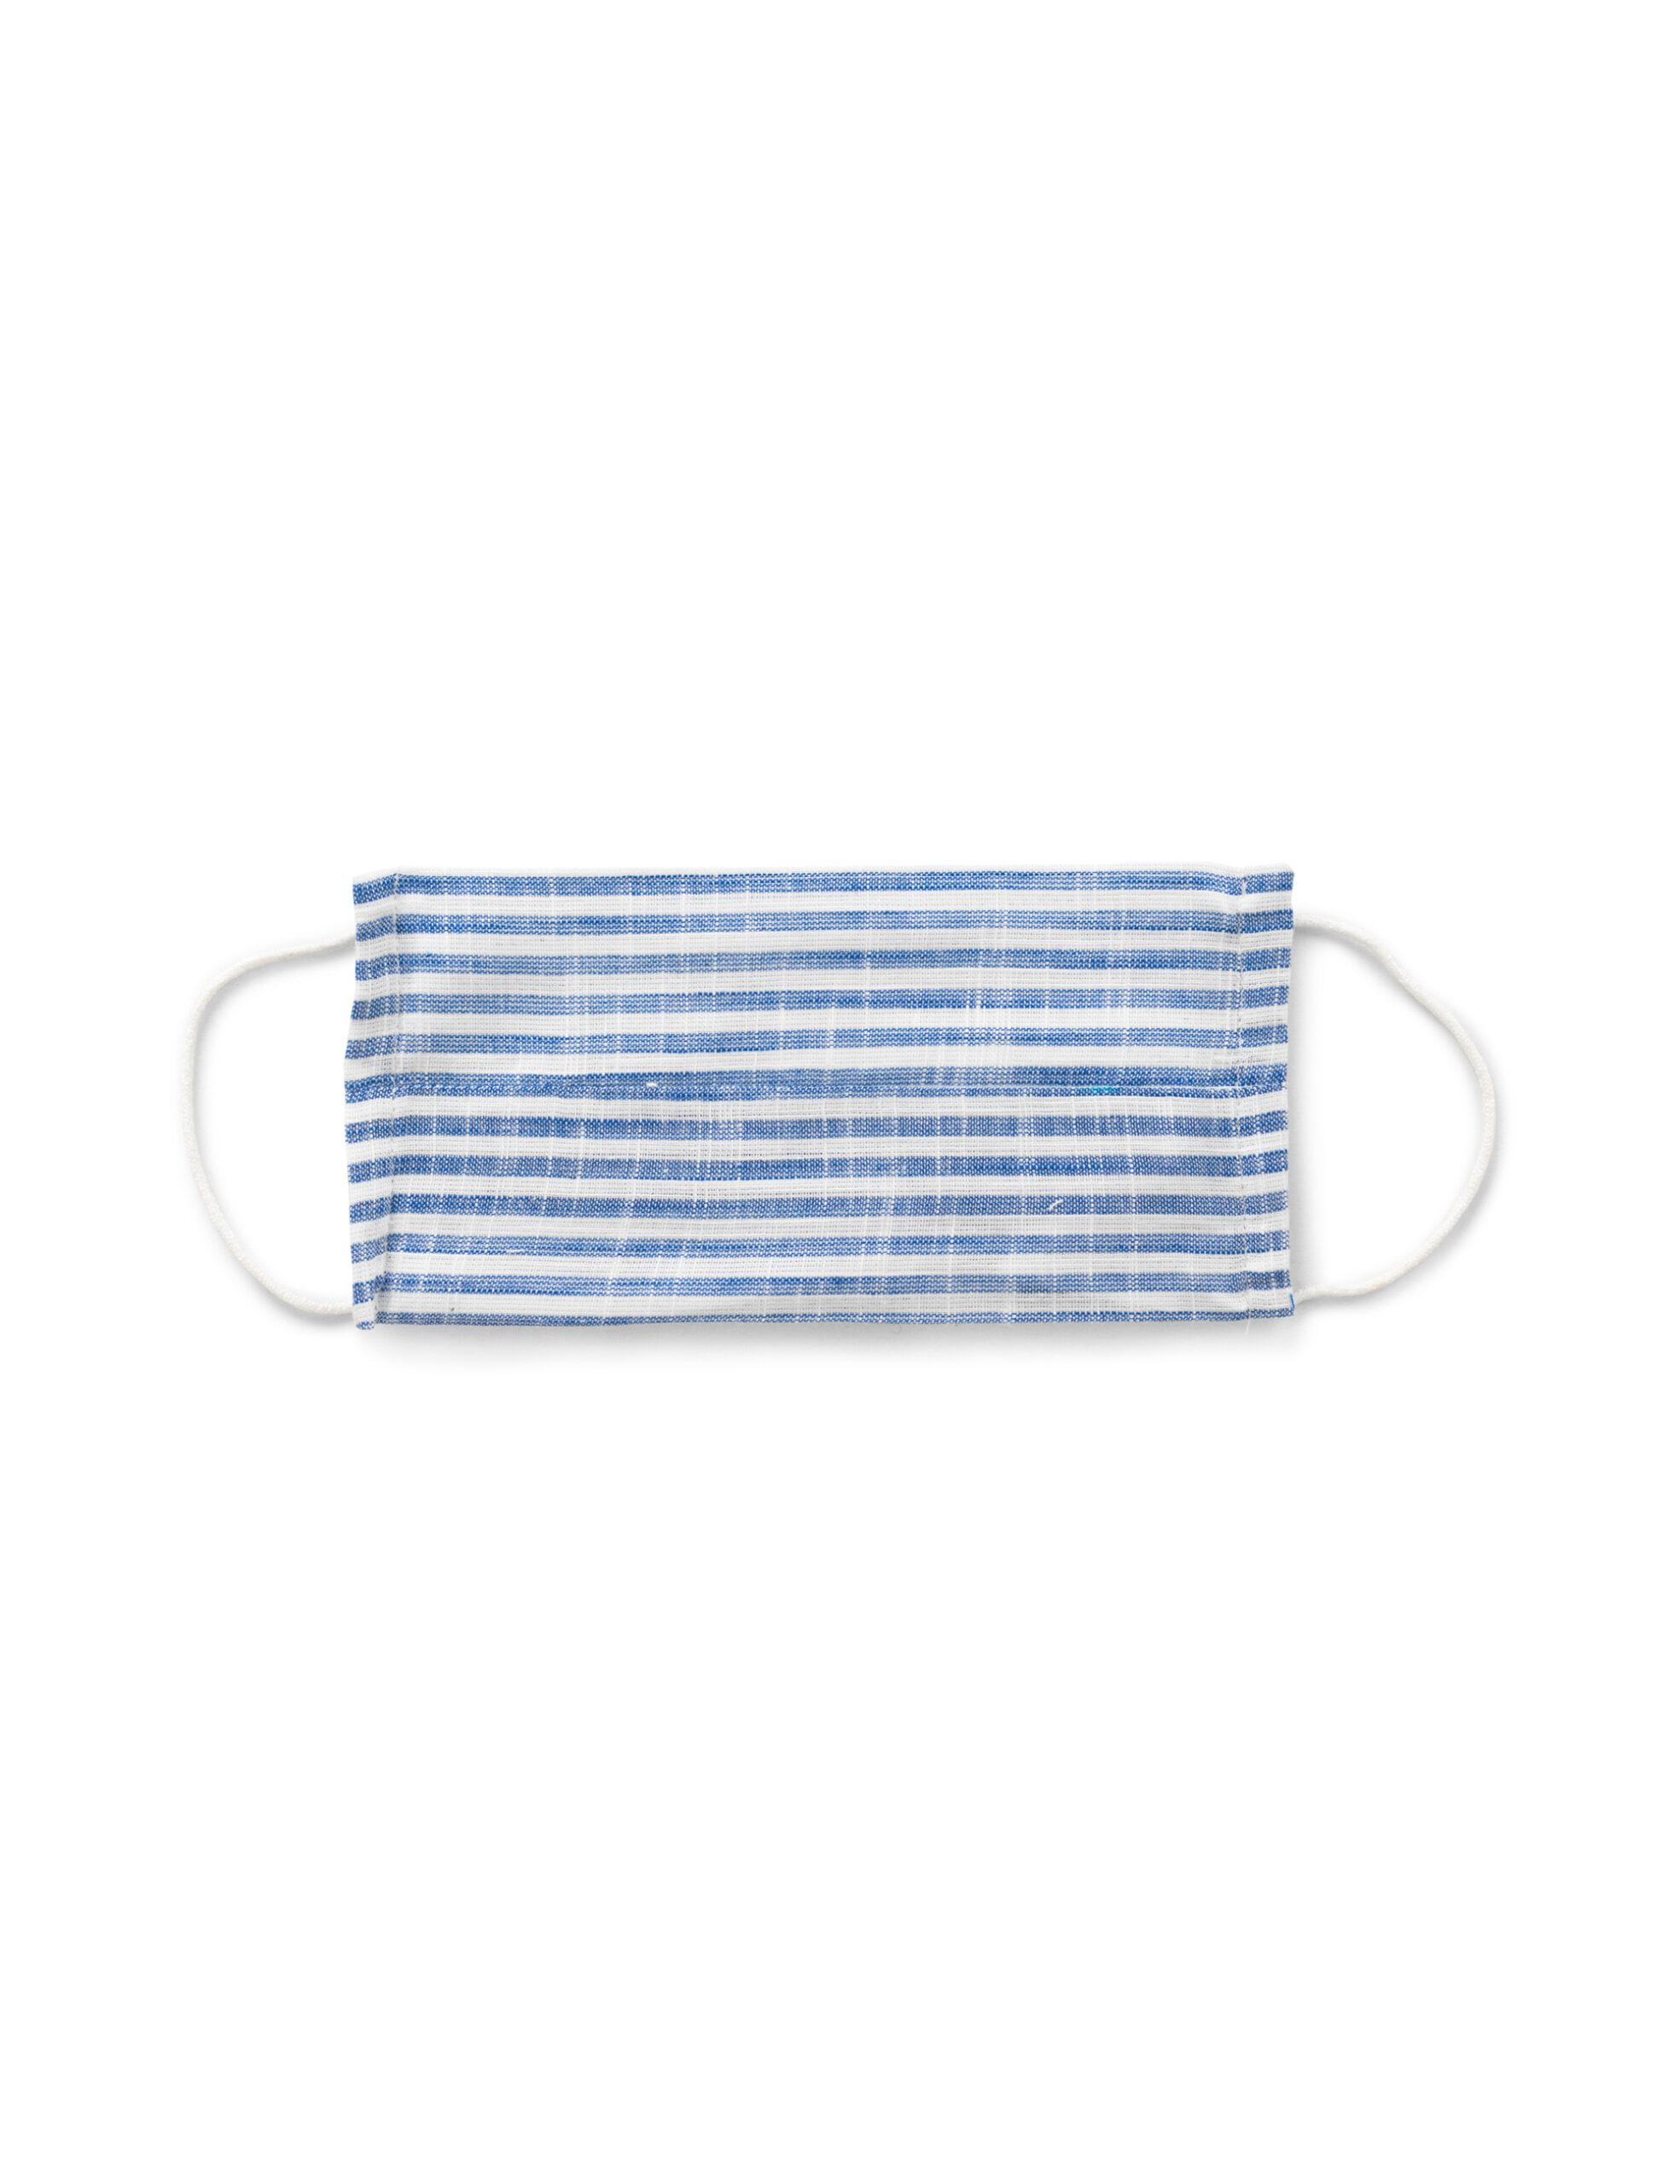 Mundbind – Light blue stripes